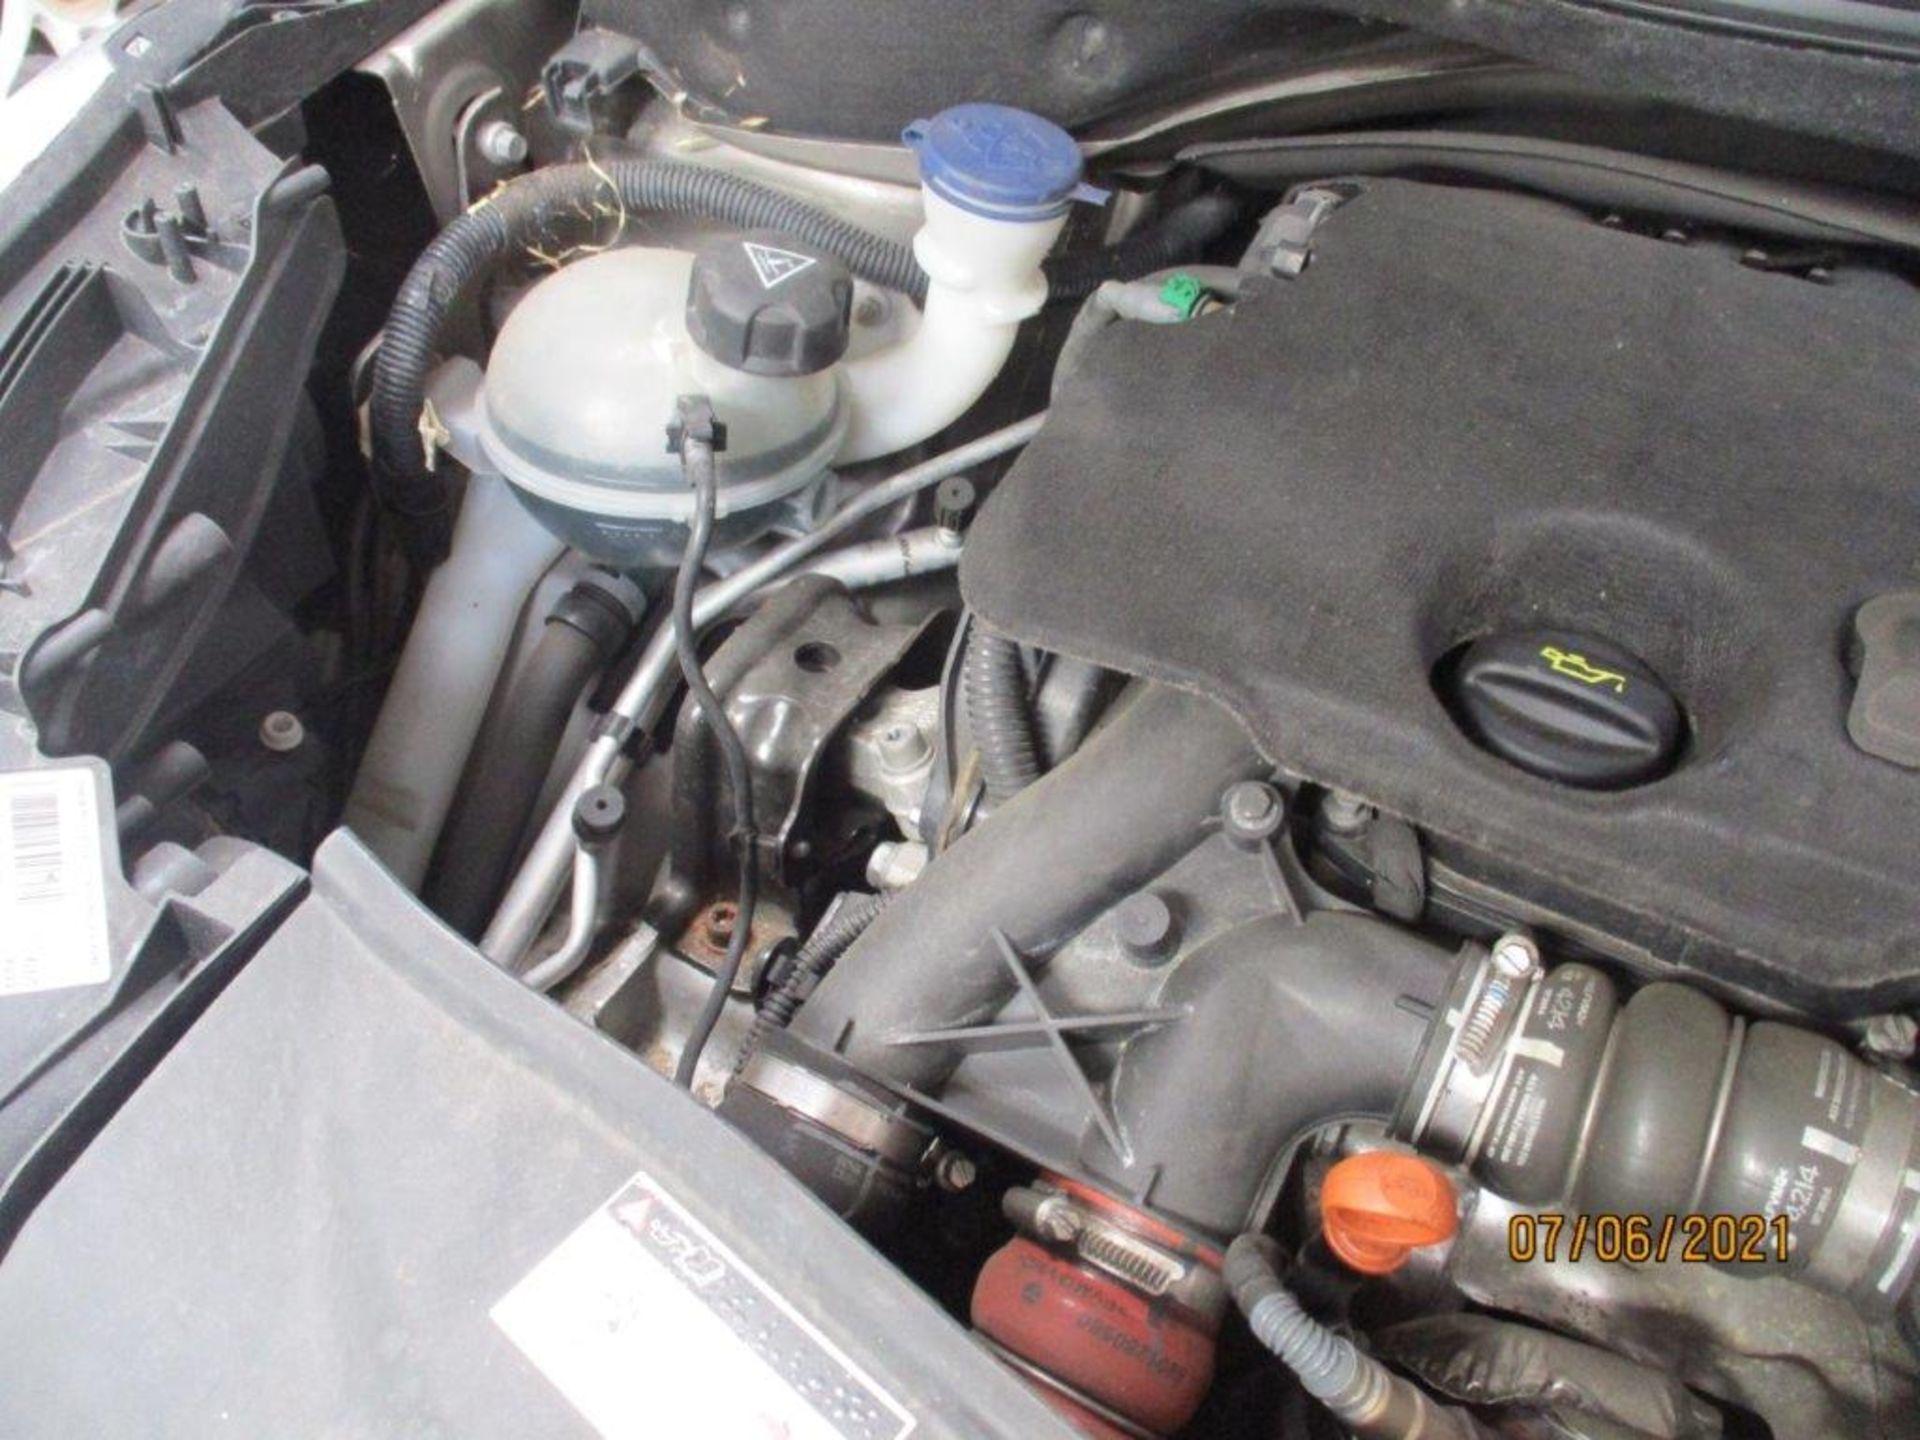 64 15 Peugeot 2008 Allure E-HDI - Image 24 of 25